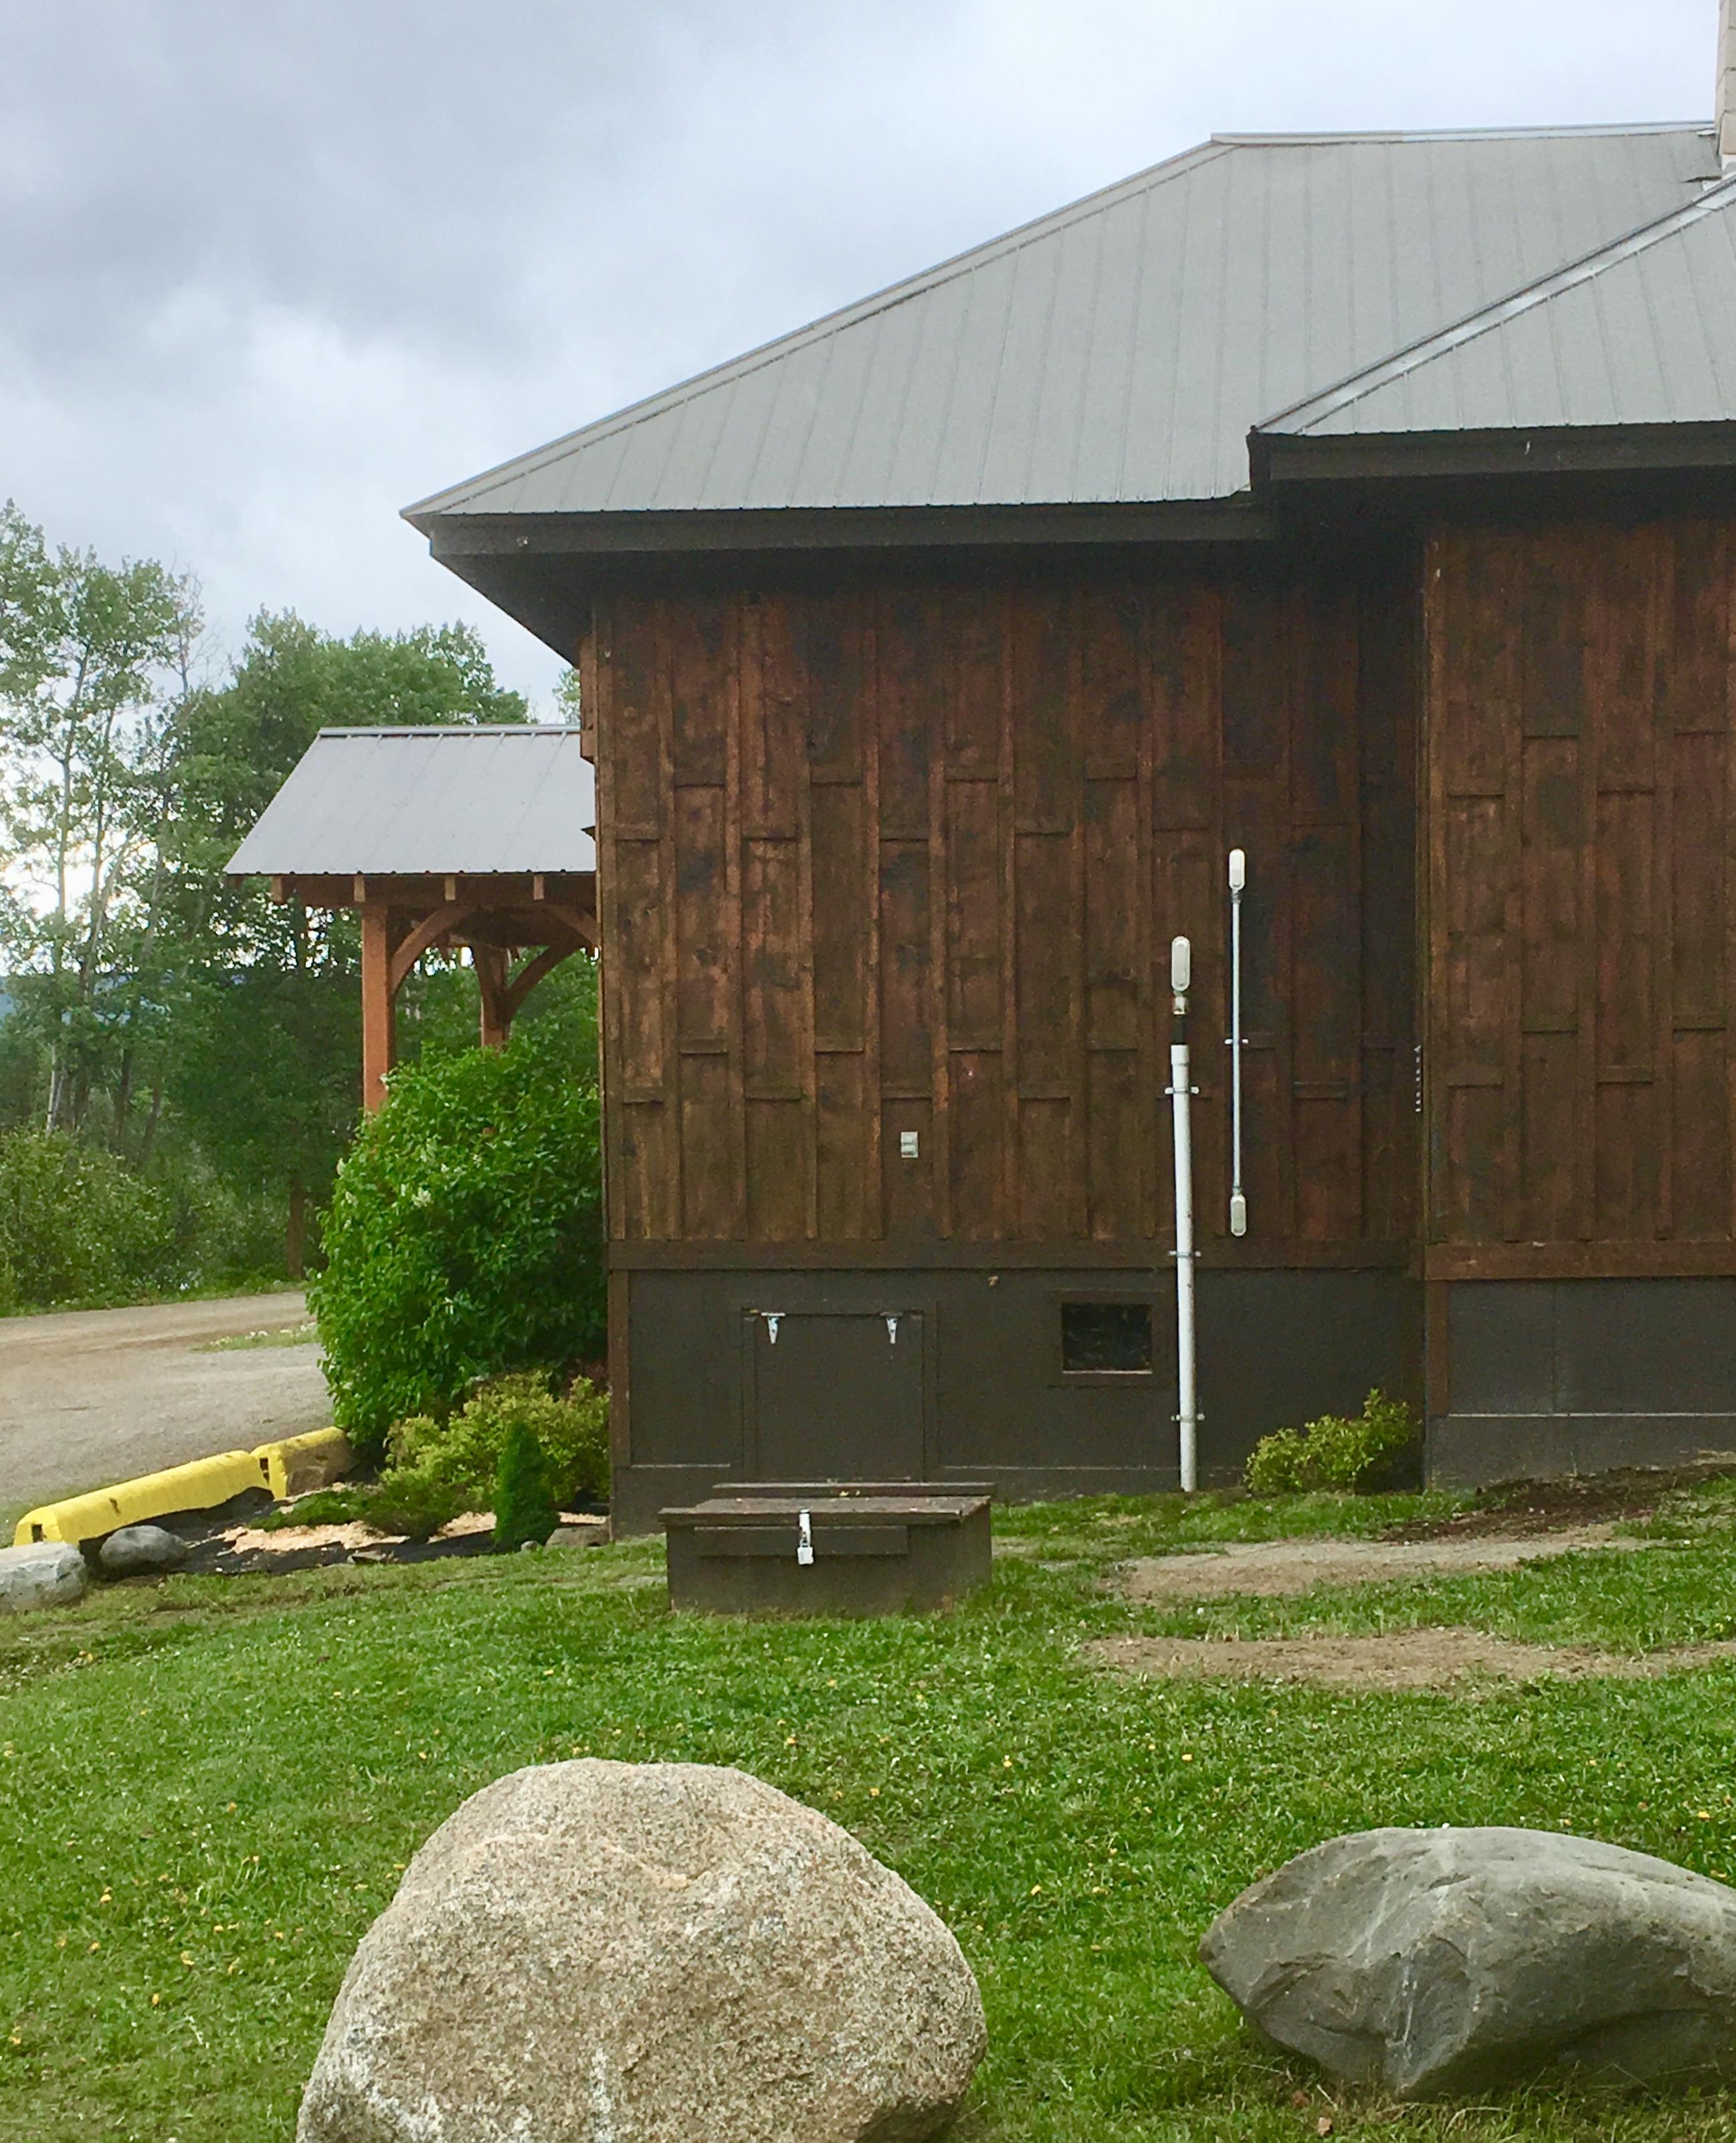 Round Lake Hall work bee, May 26 - ROUND LAKE COMMUNITY ASSOCIATION